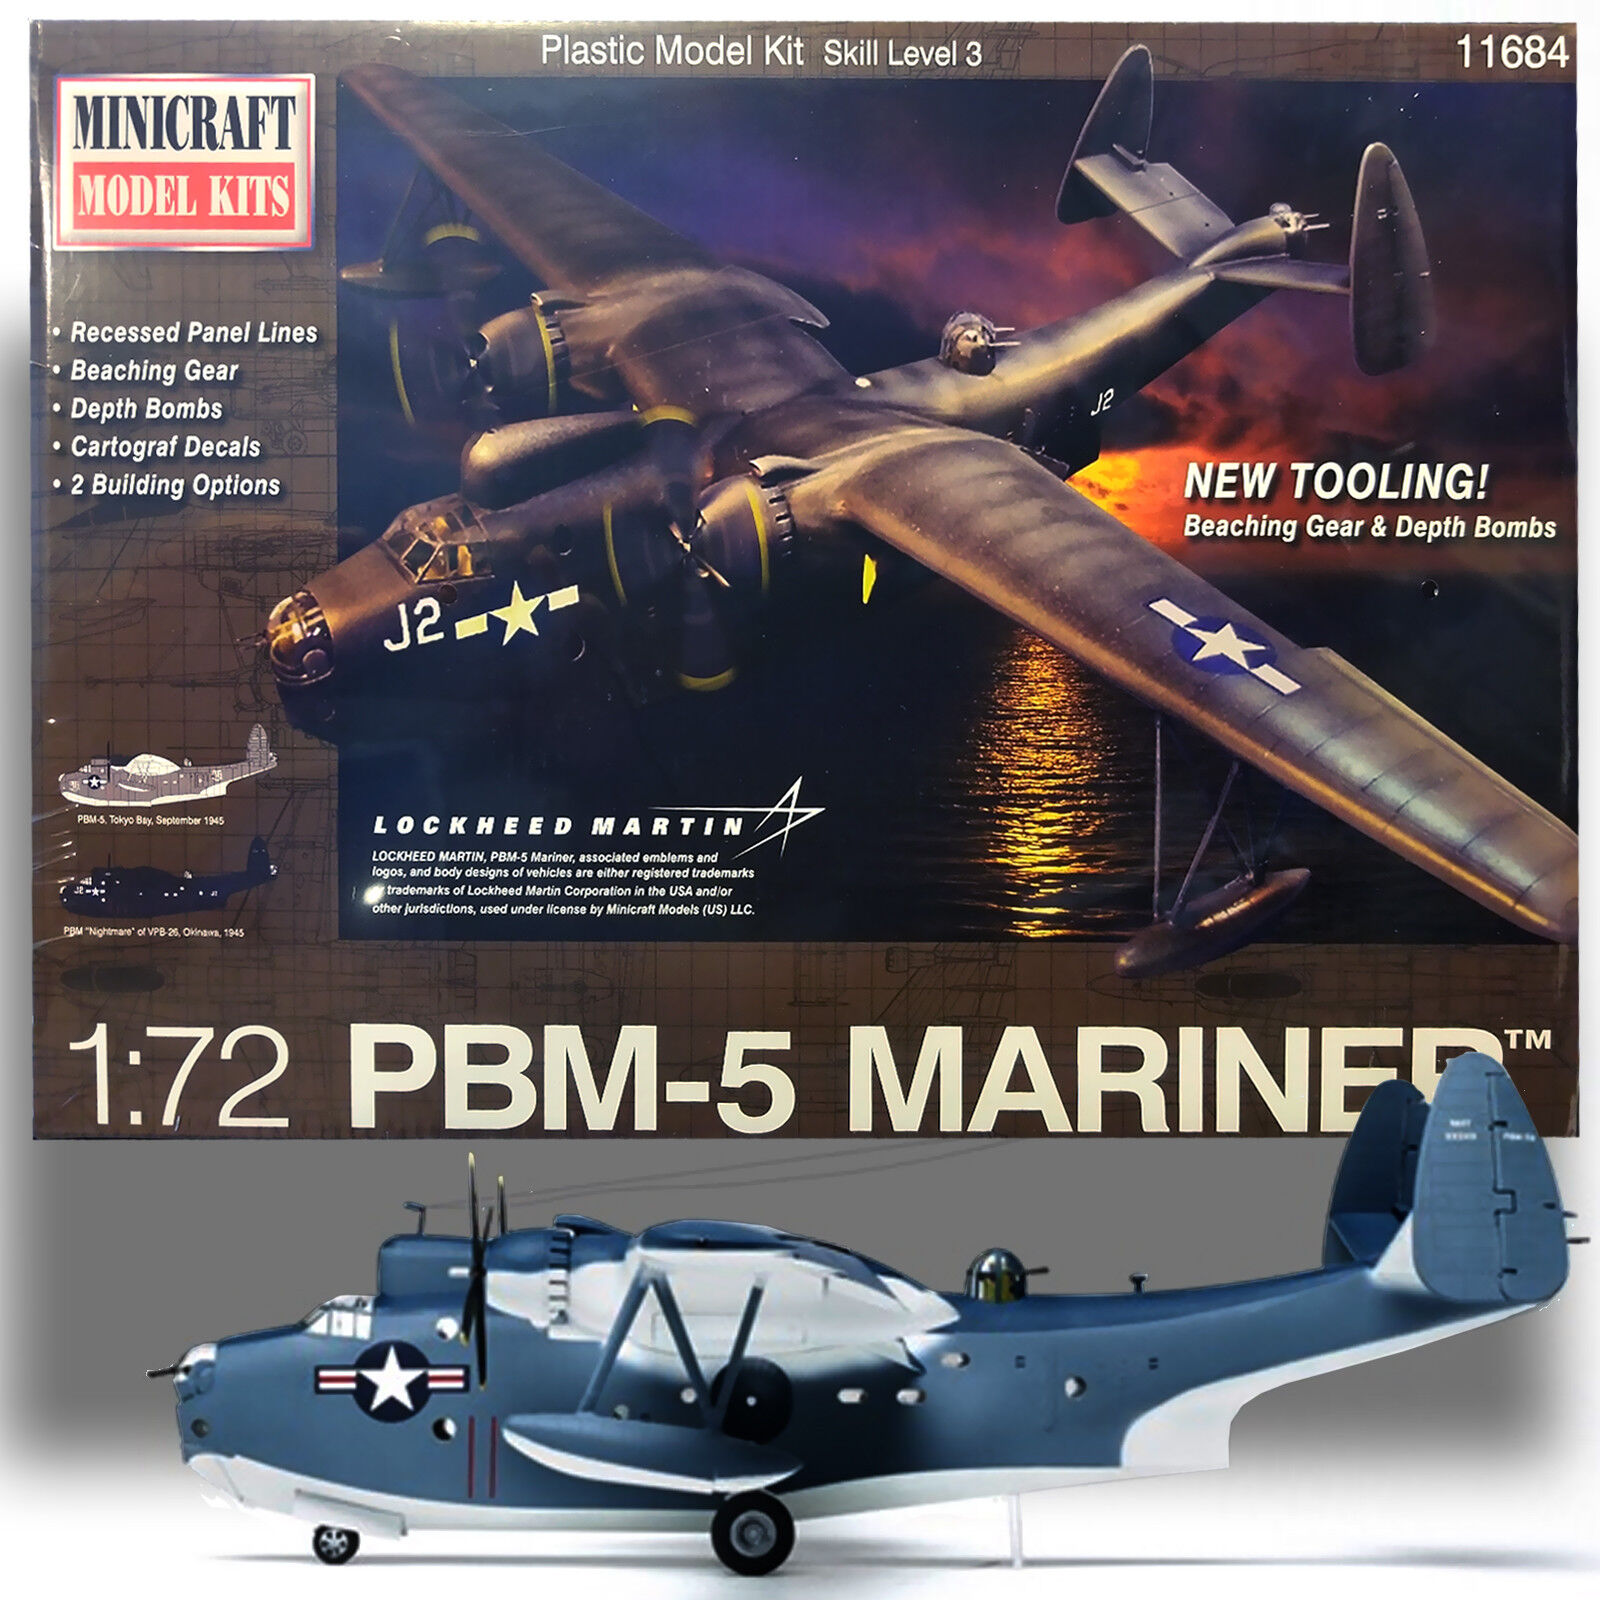 MINI CRAFT 1  72 PBM -5 MARINER PRECISION modellllerL KIT 11684